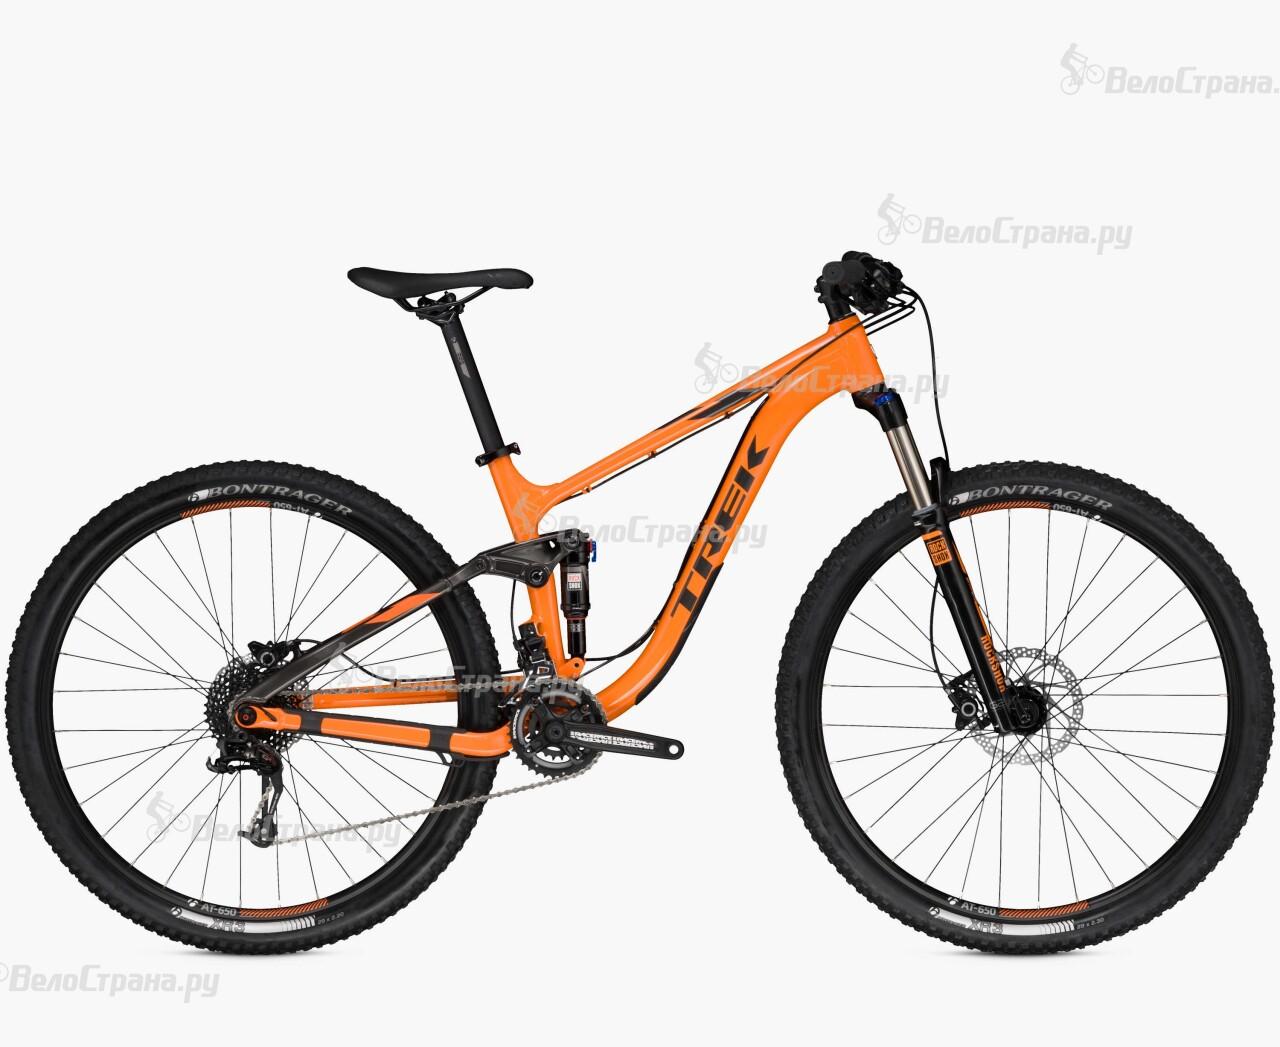 Велосипед Trek Fuel EX 5 29 (2016) велосипед trek fuel ex 9 29 2017